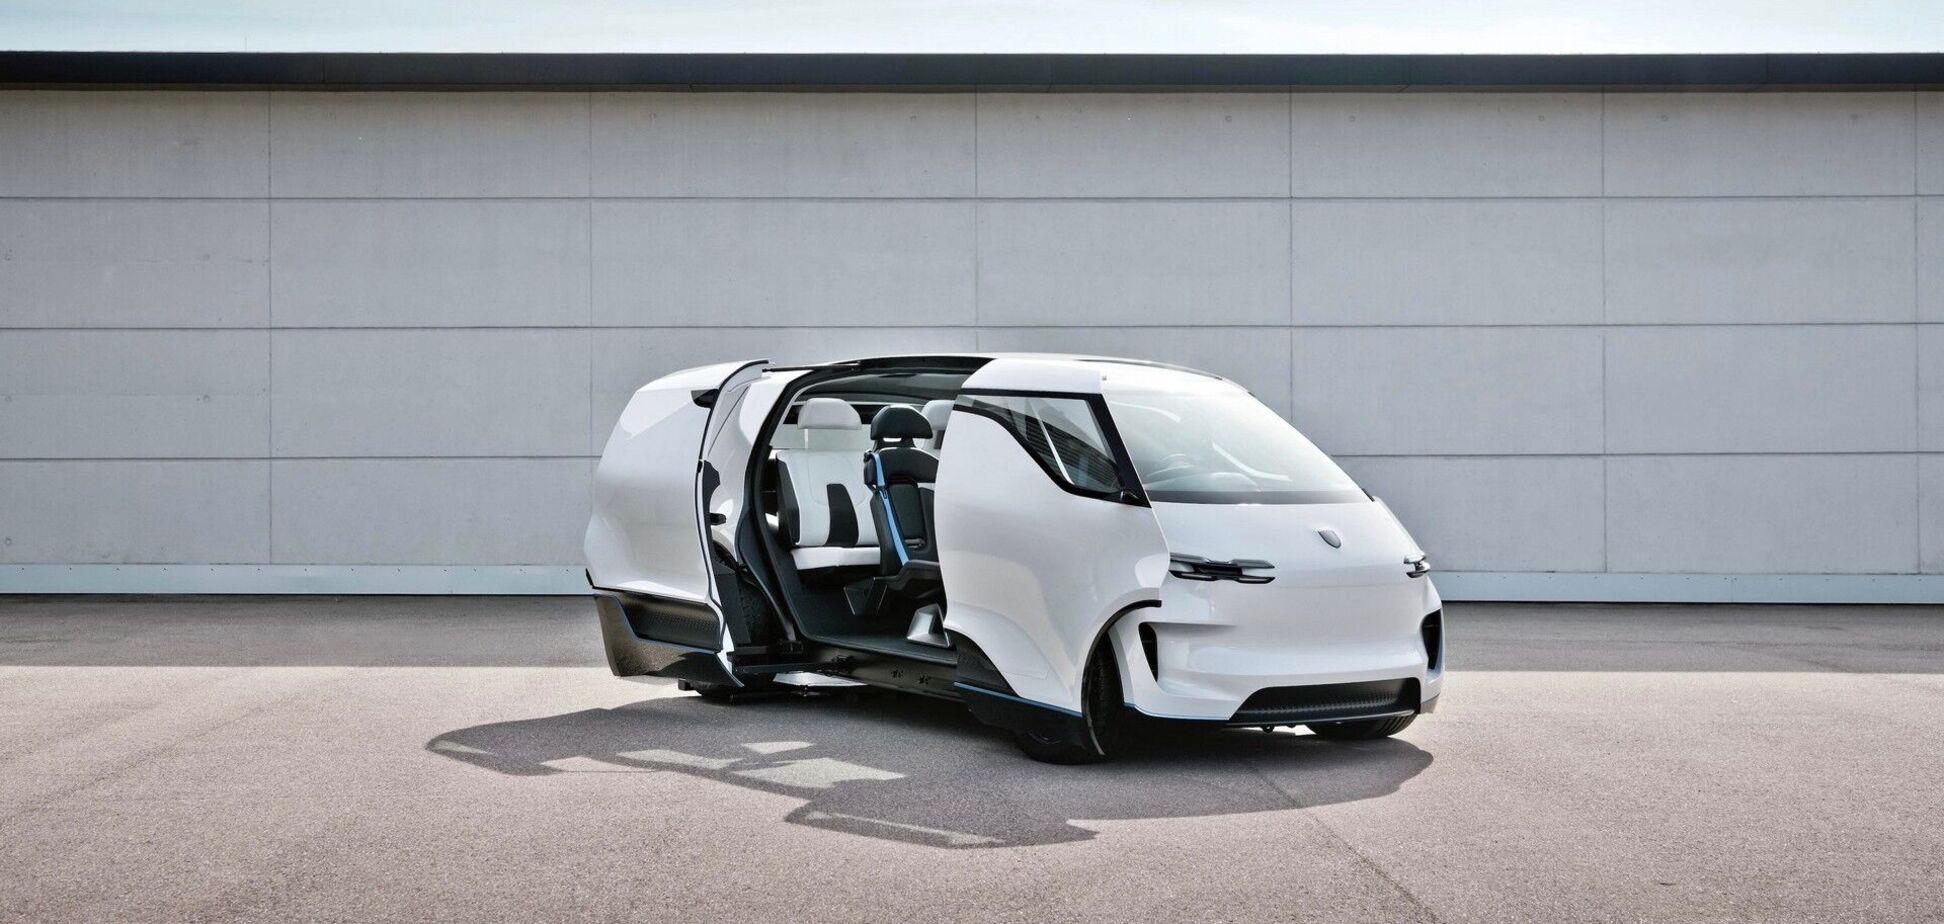 Porsche презентувала концептуальний електрових